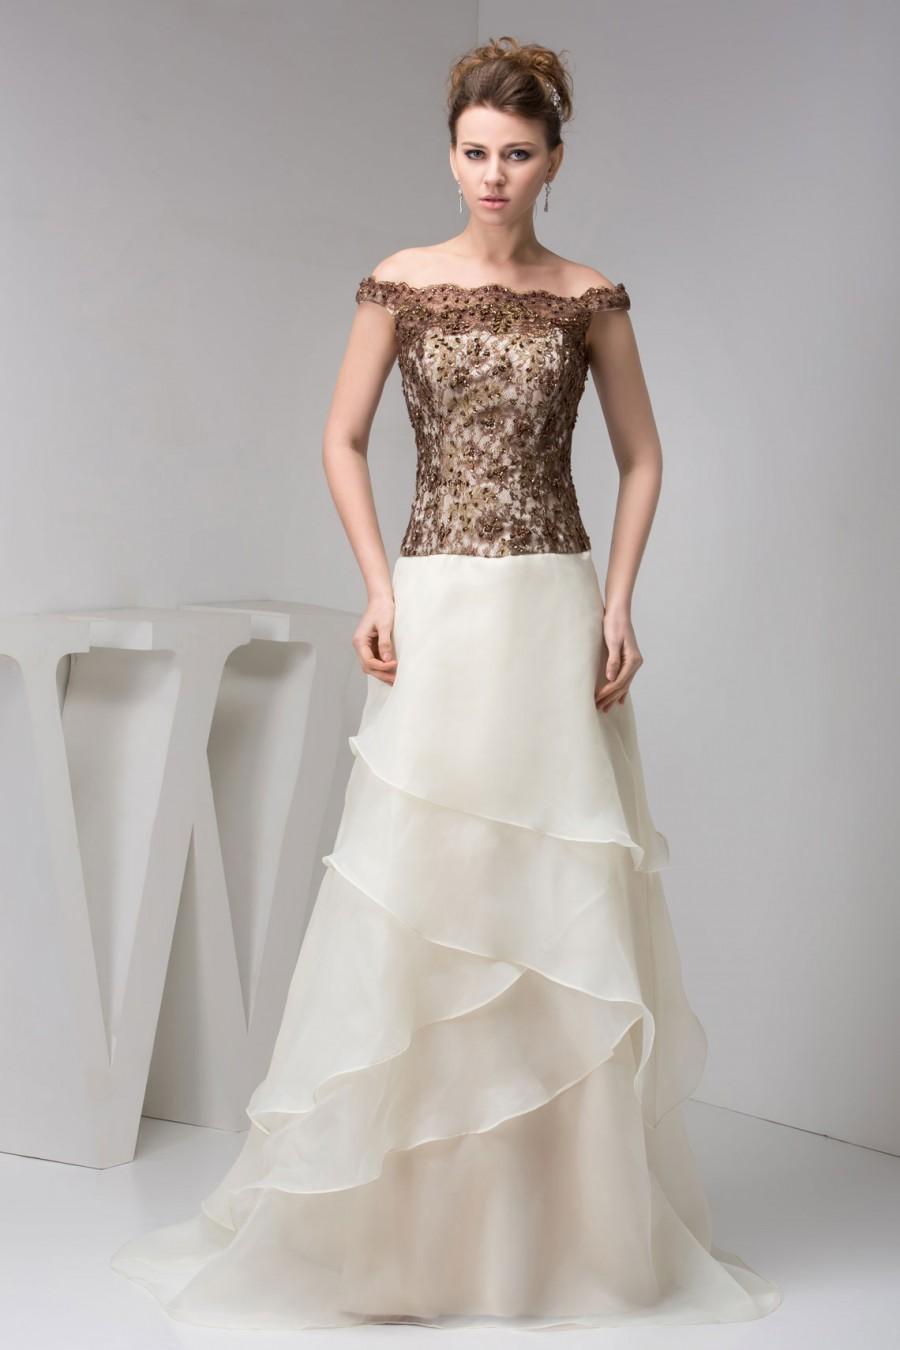 Mariage - dresses 2014